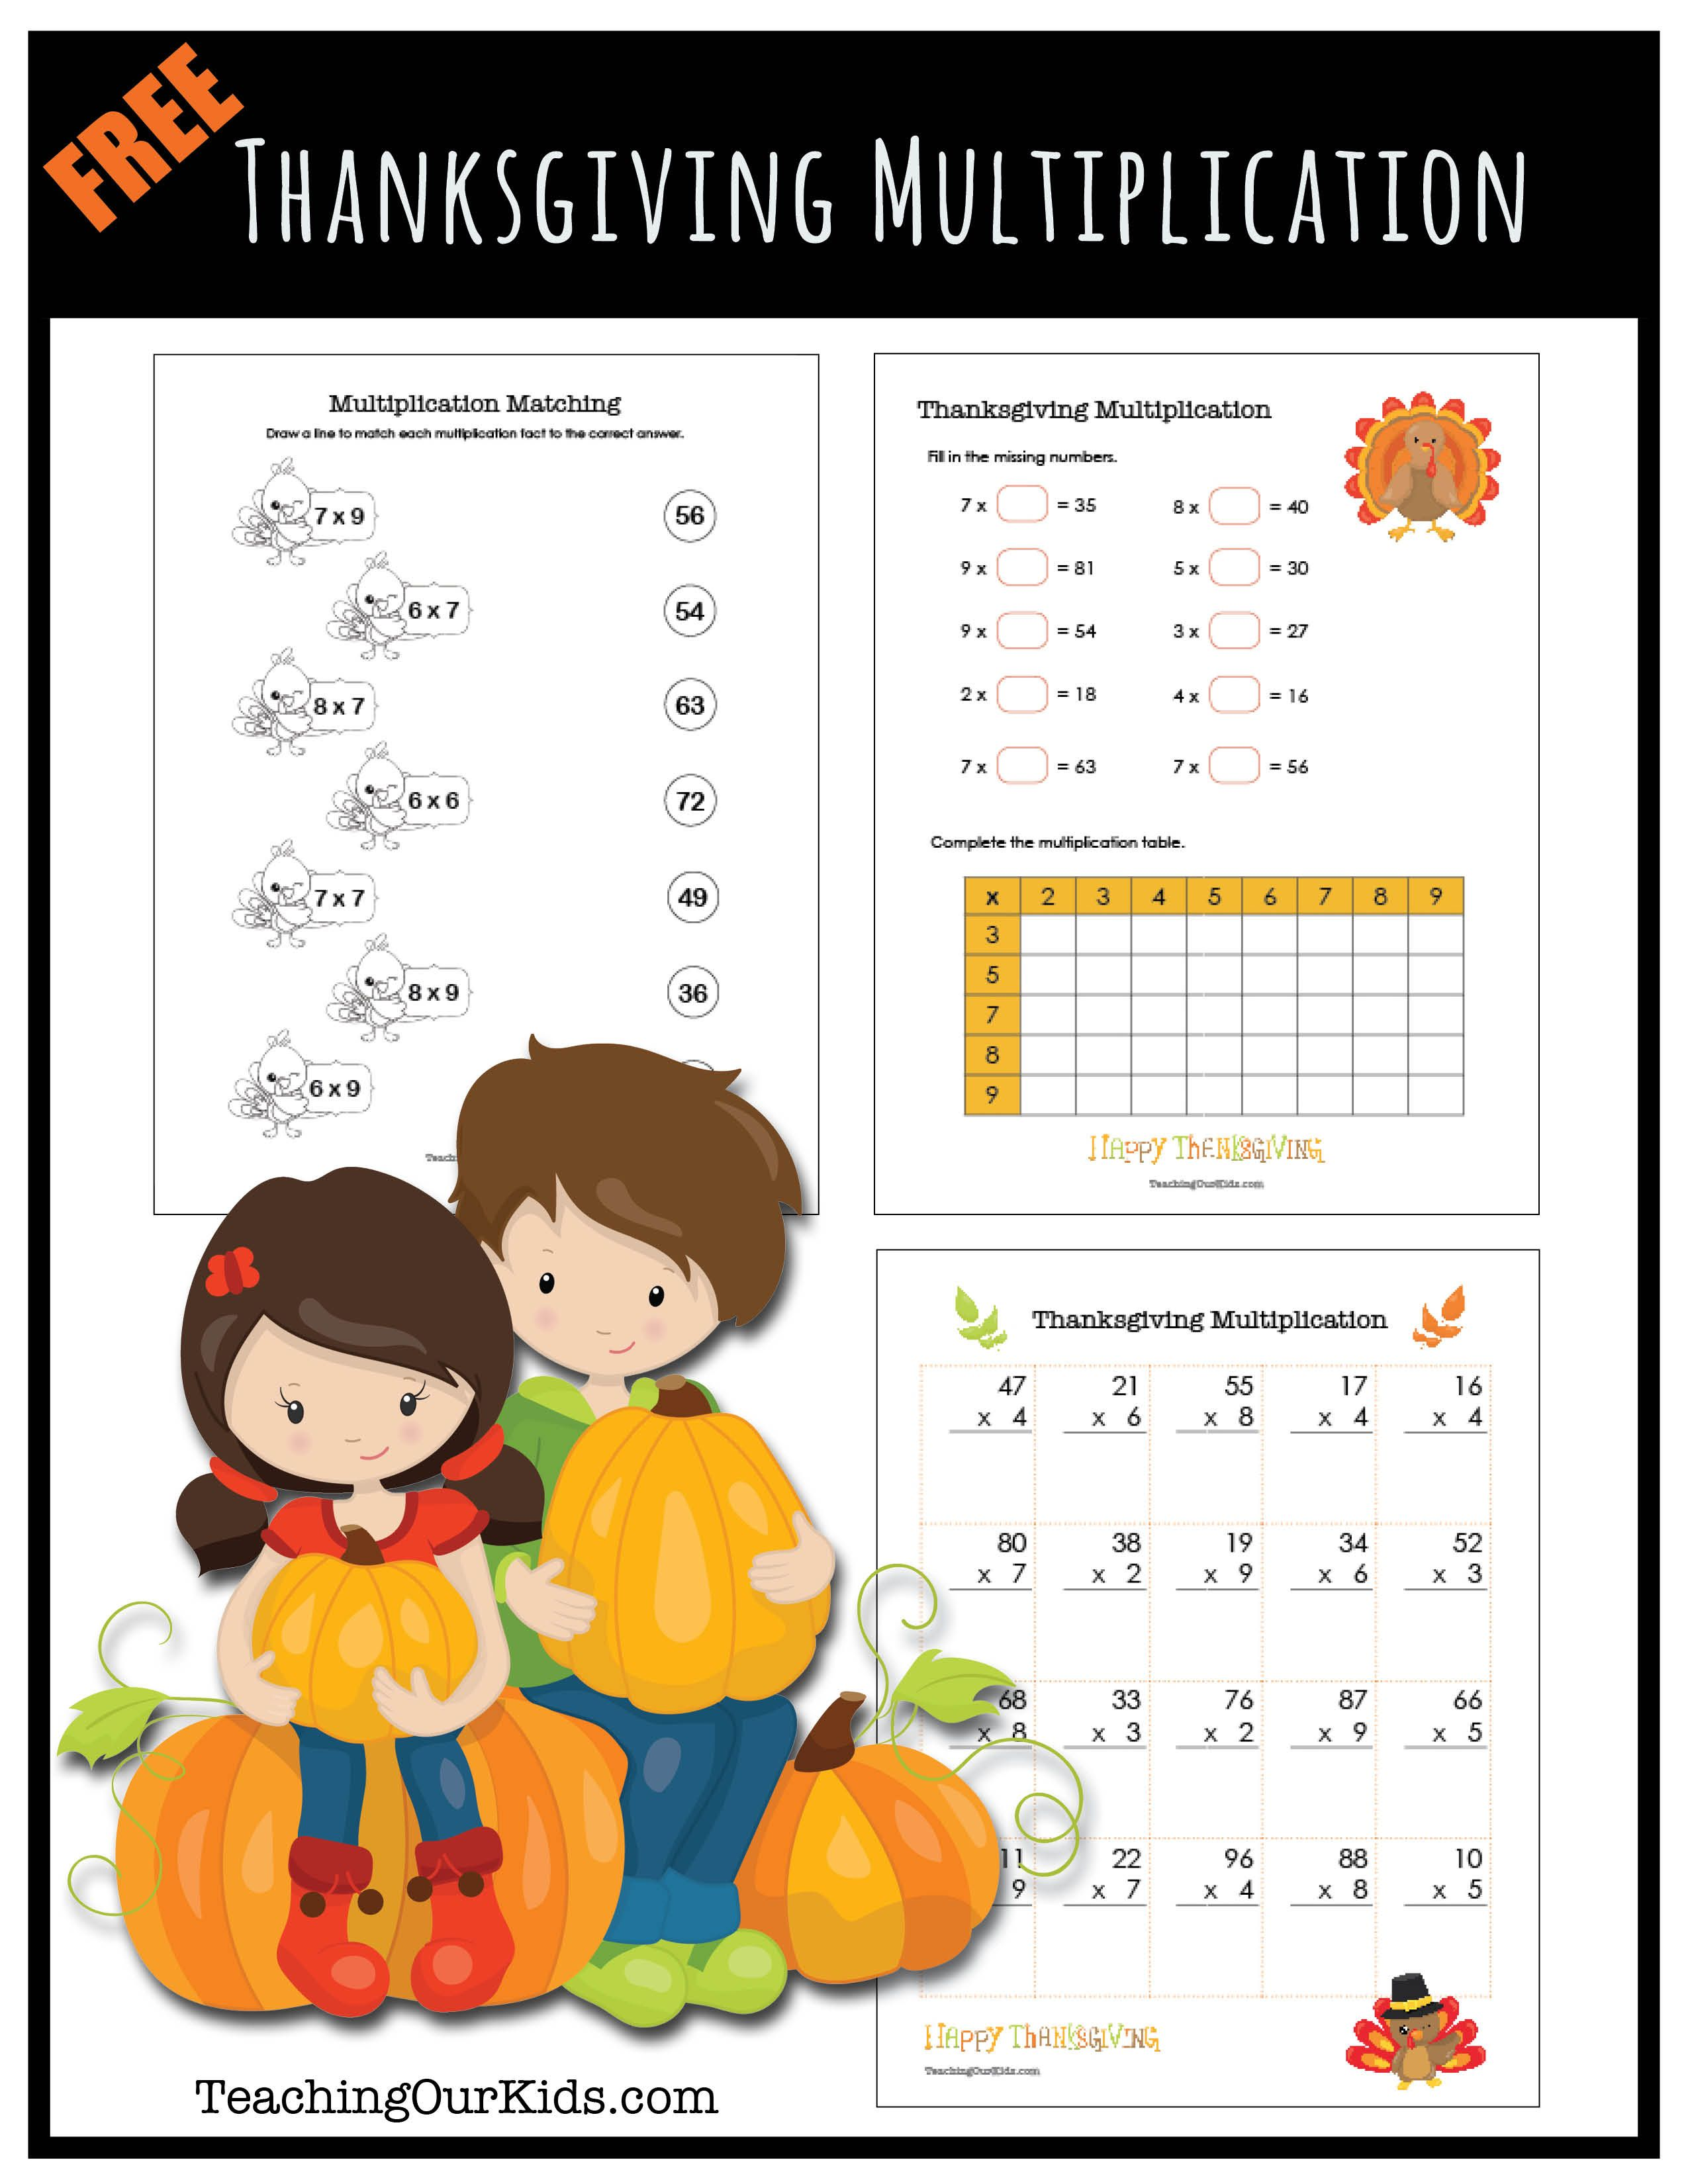 Free Thanksgiving Multiplication Pack